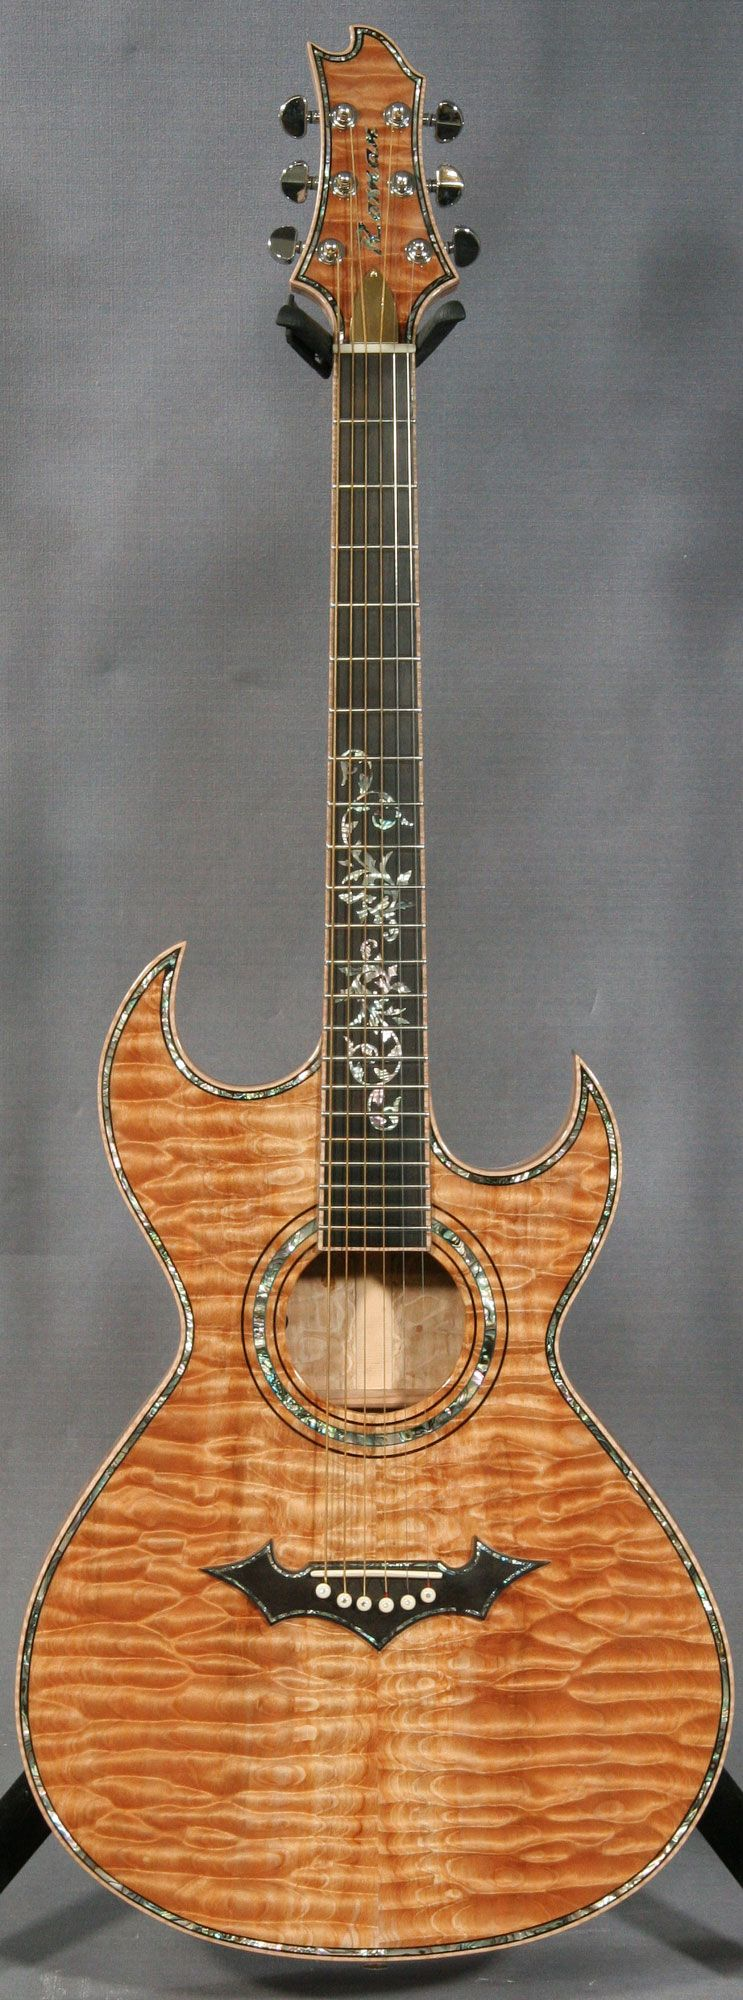 roman custom acoustic slim double cutaway guitar lords of the strings viol o instrumentos. Black Bedroom Furniture Sets. Home Design Ideas